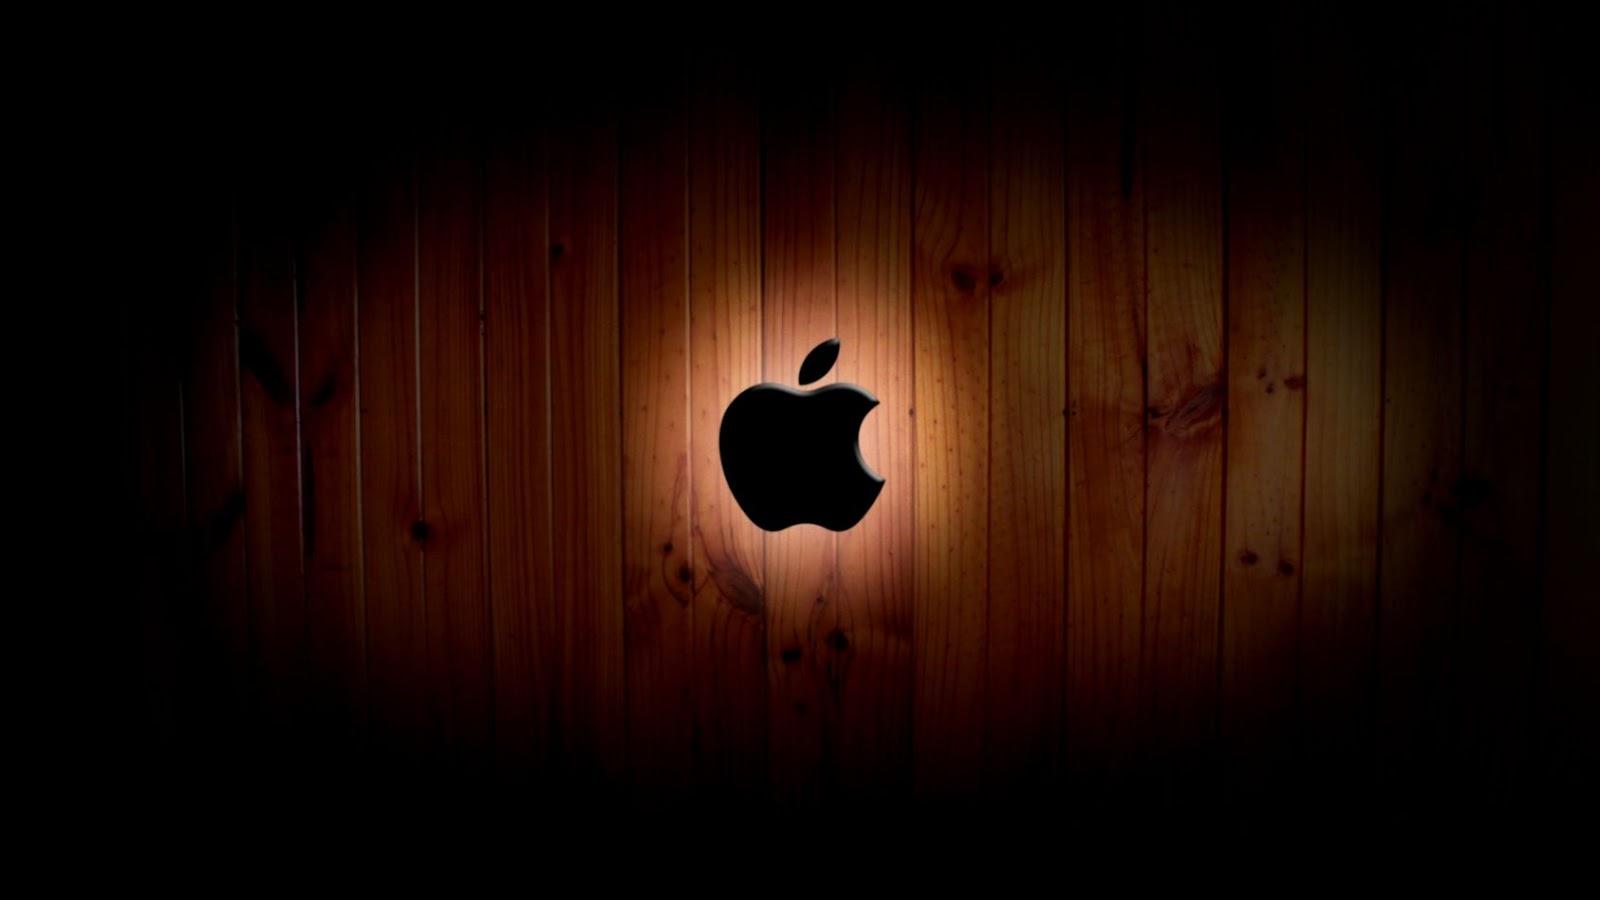 mac wallpaper hd